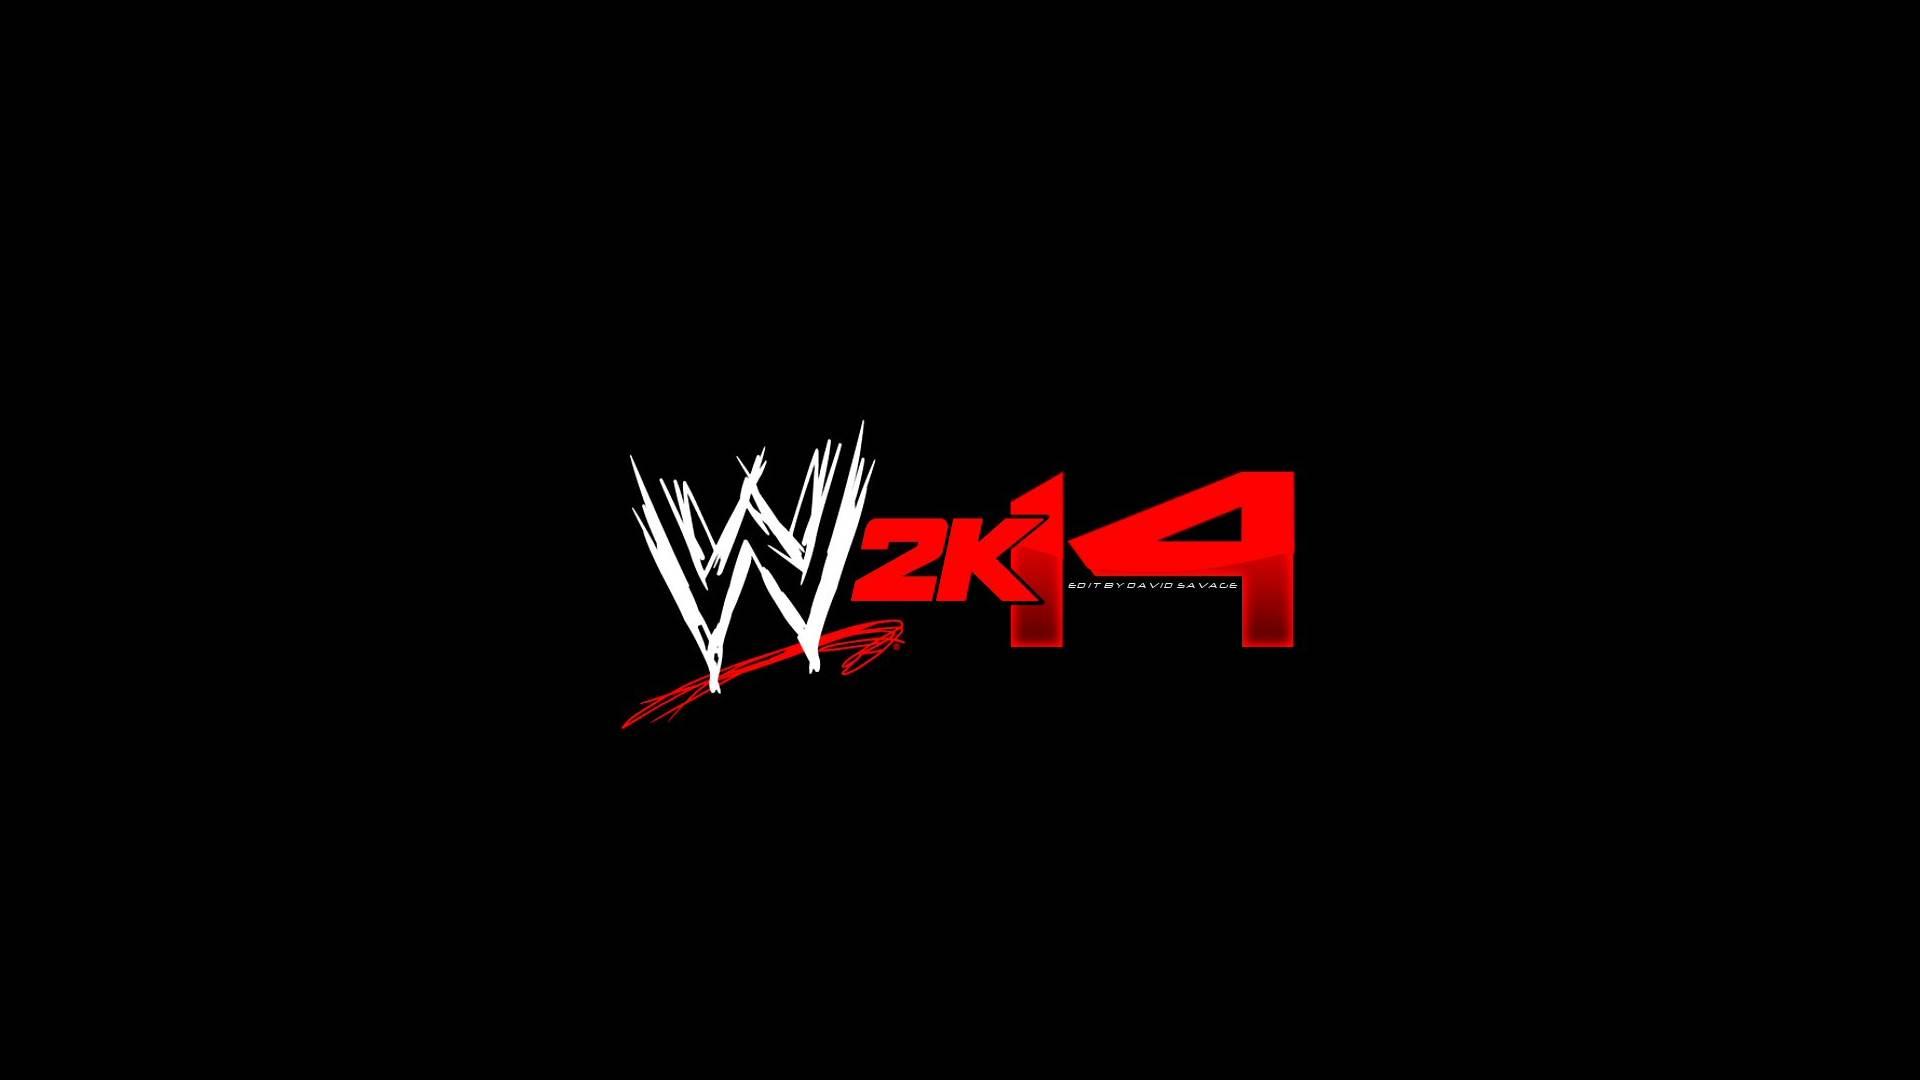 WWE 2K14 Logo Exclusive HD Wallpapers 5641 1920x1080